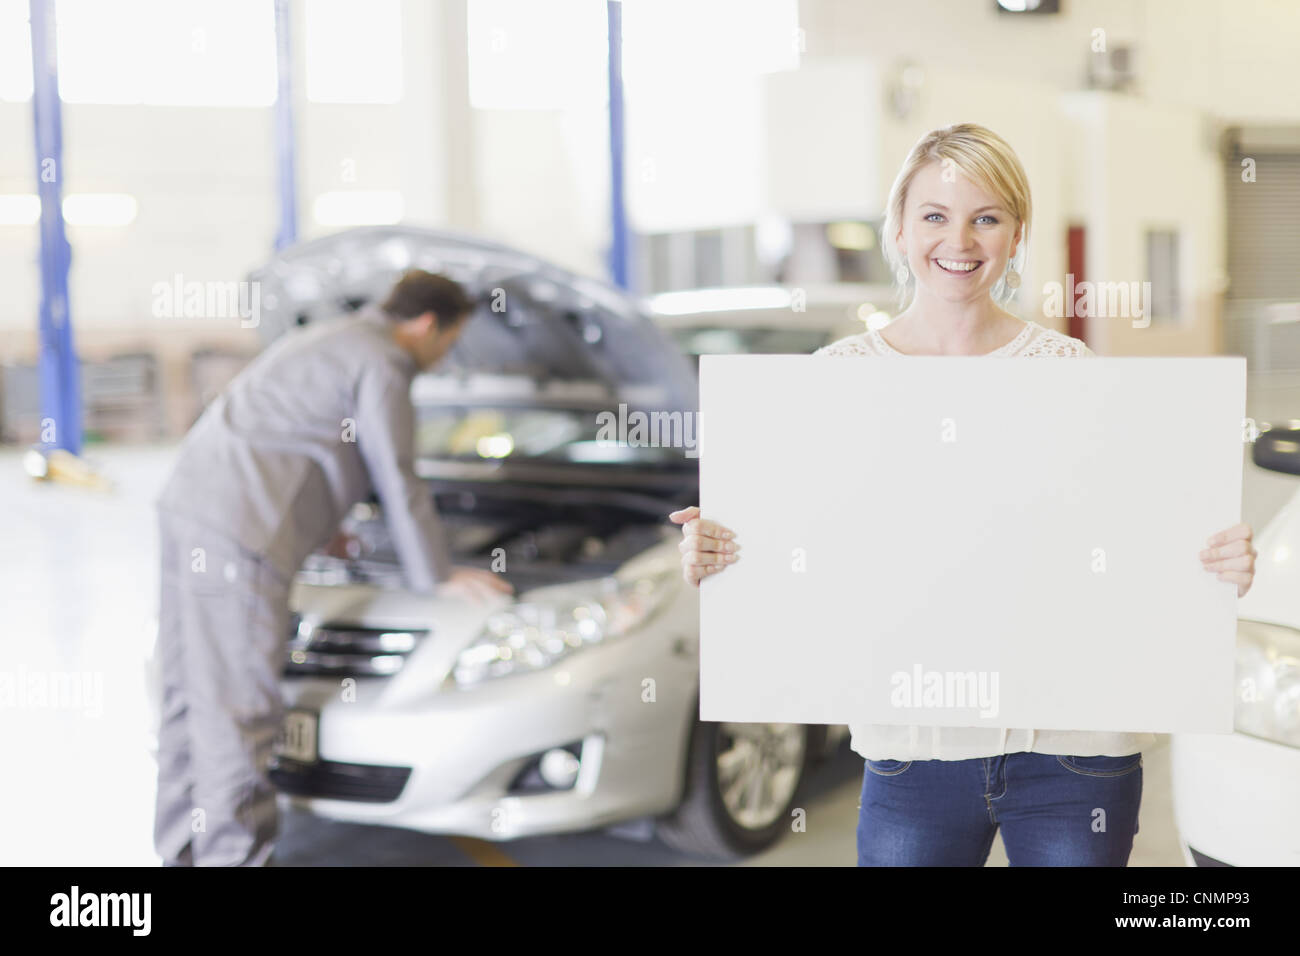 Garage Sign Auto Repair Stockfotos & Garage Sign Auto Repair Bilder ...